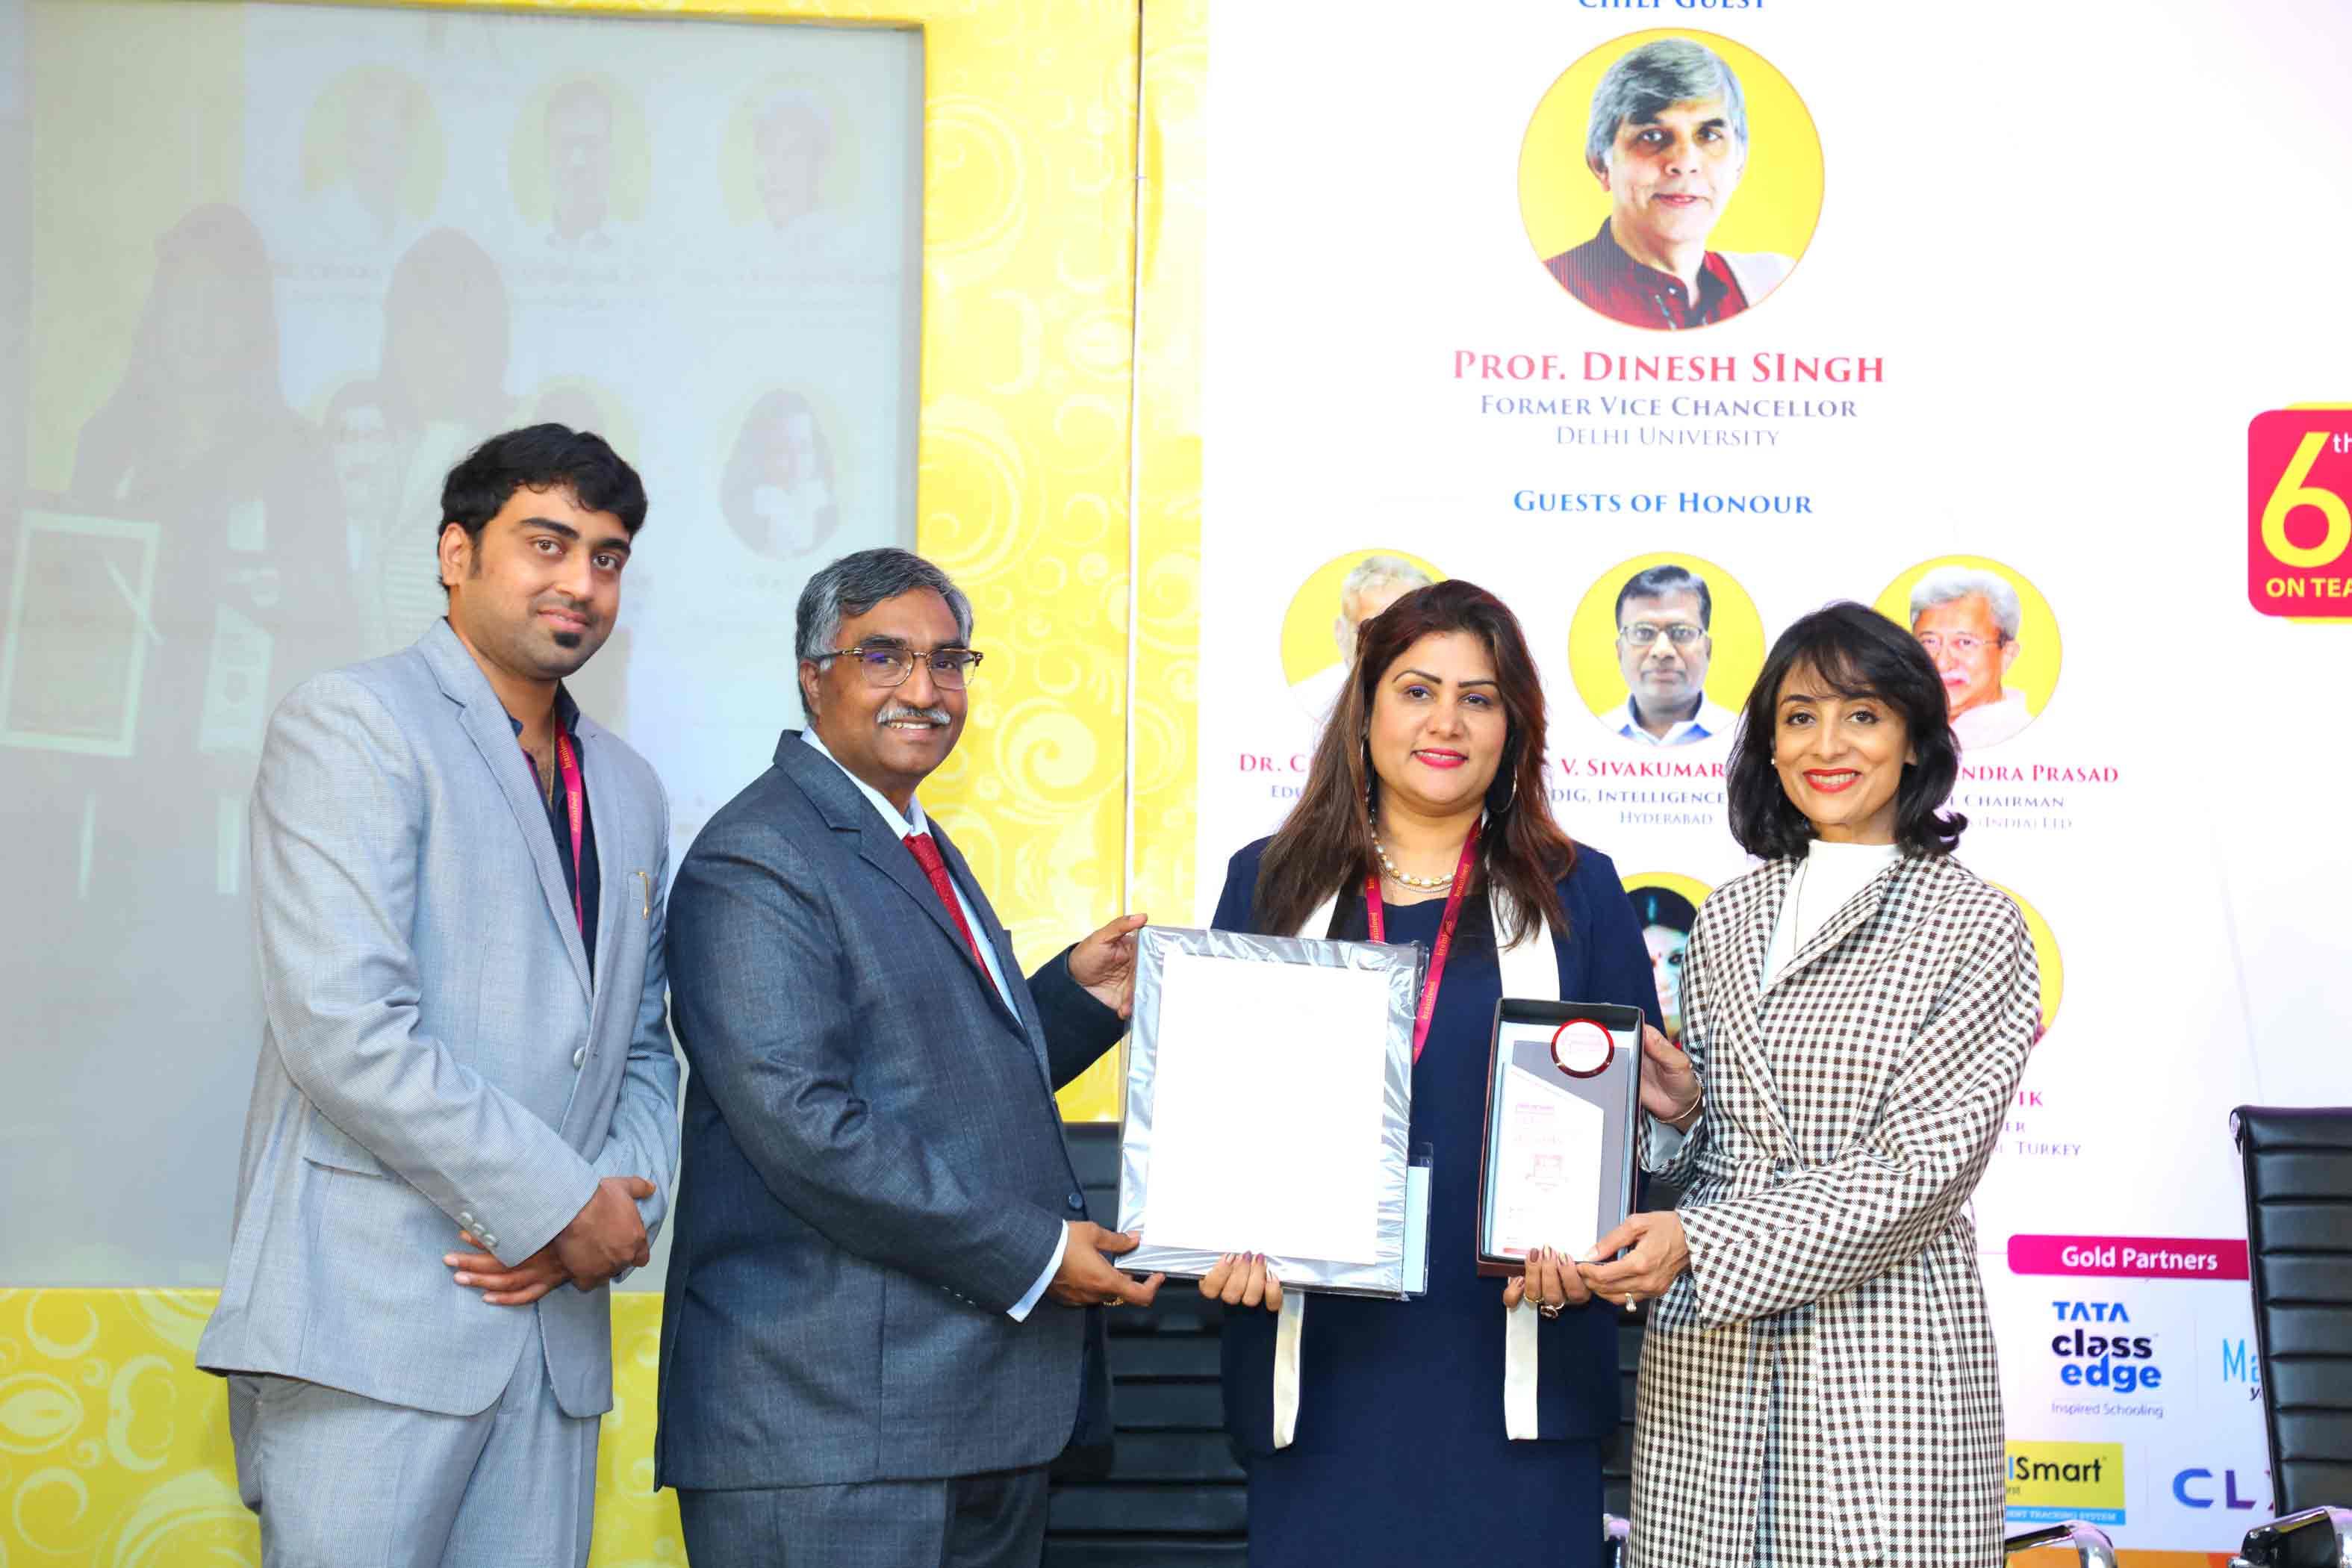 Dr.-Pillai-Global-Academy,-Borivali-(W),-Mumbai,-Maharashtra-(2)